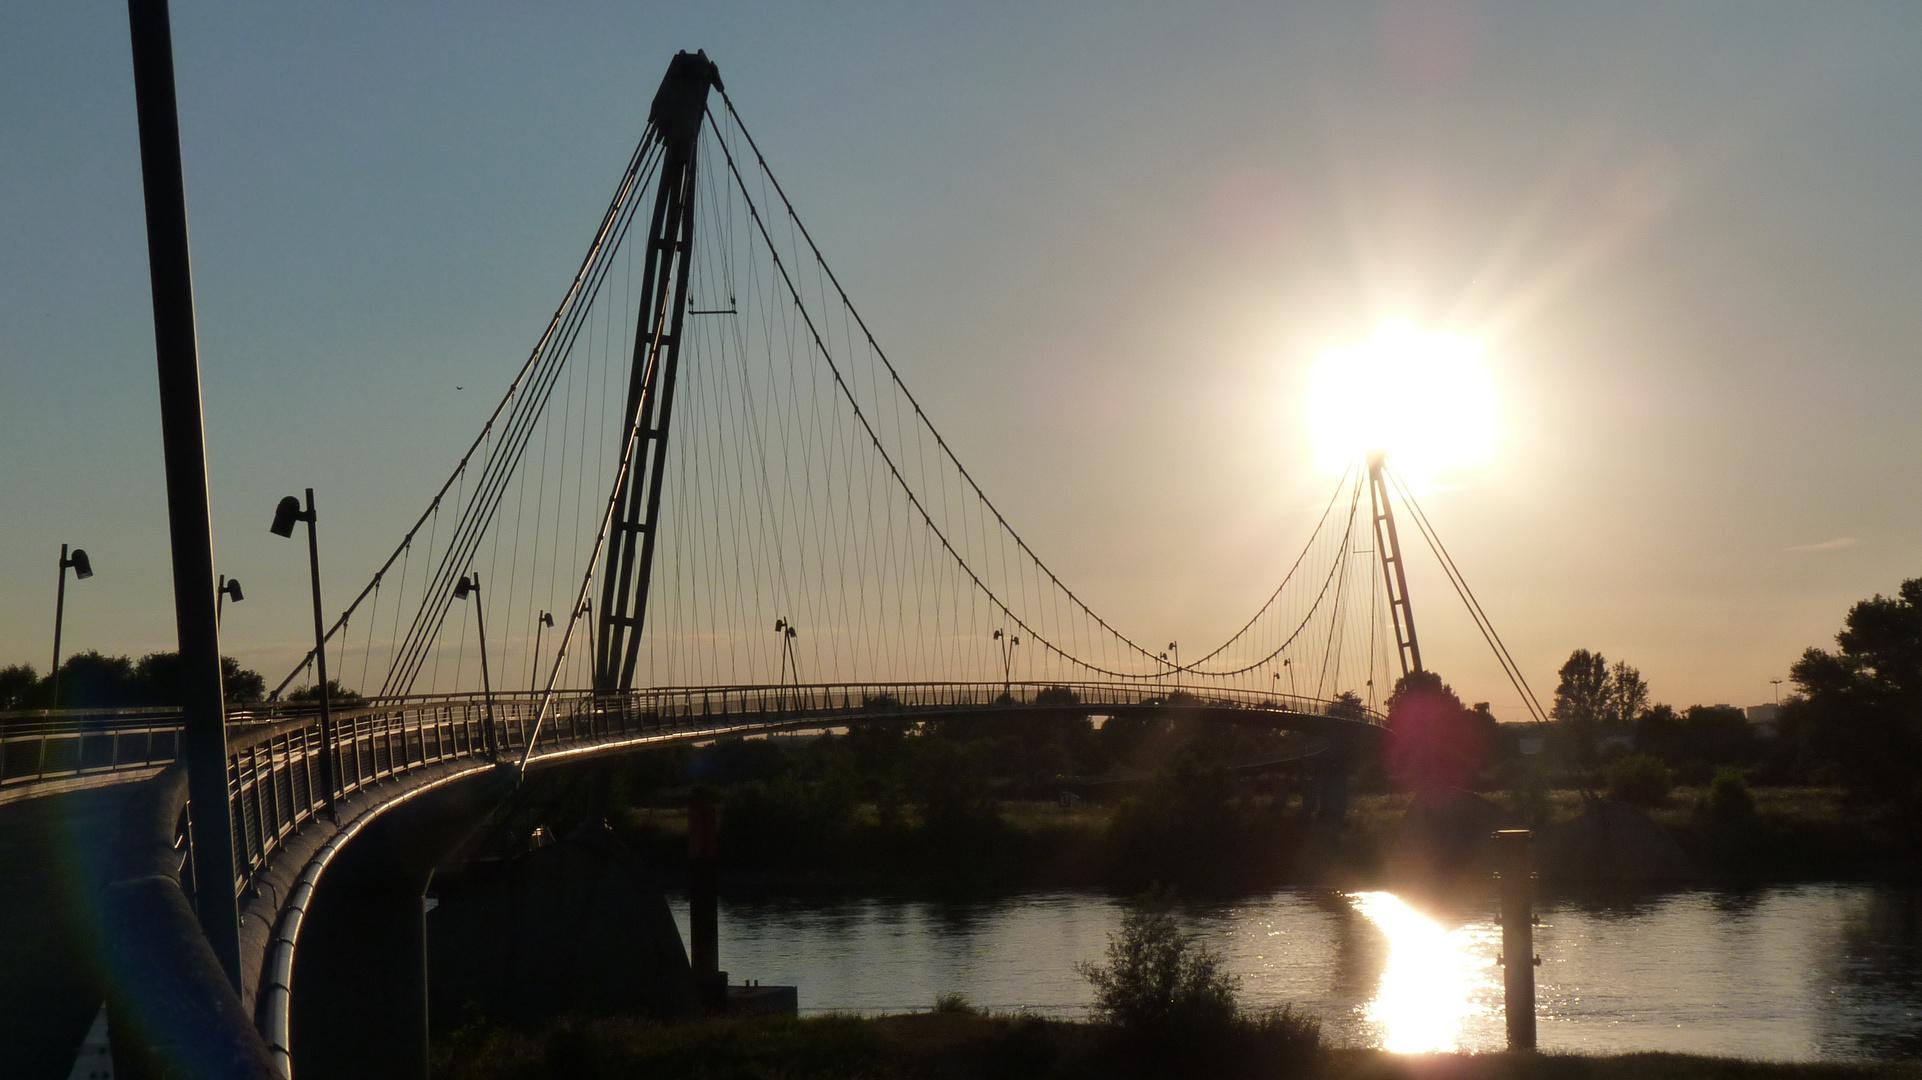 Hängebrücke in Magdeburg